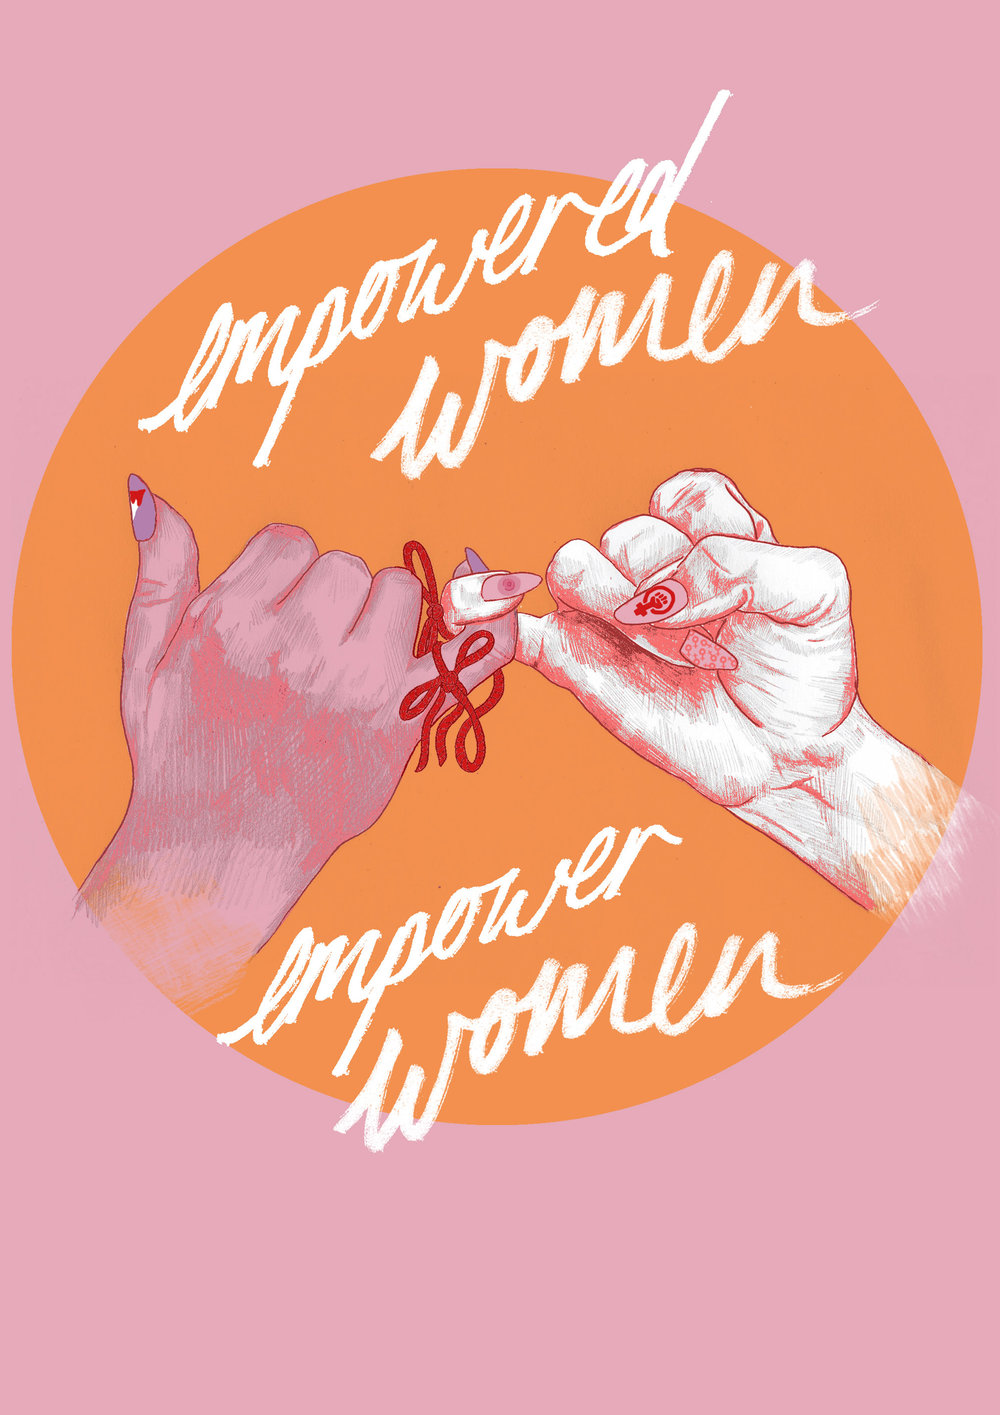 empowerpostcard.jpg